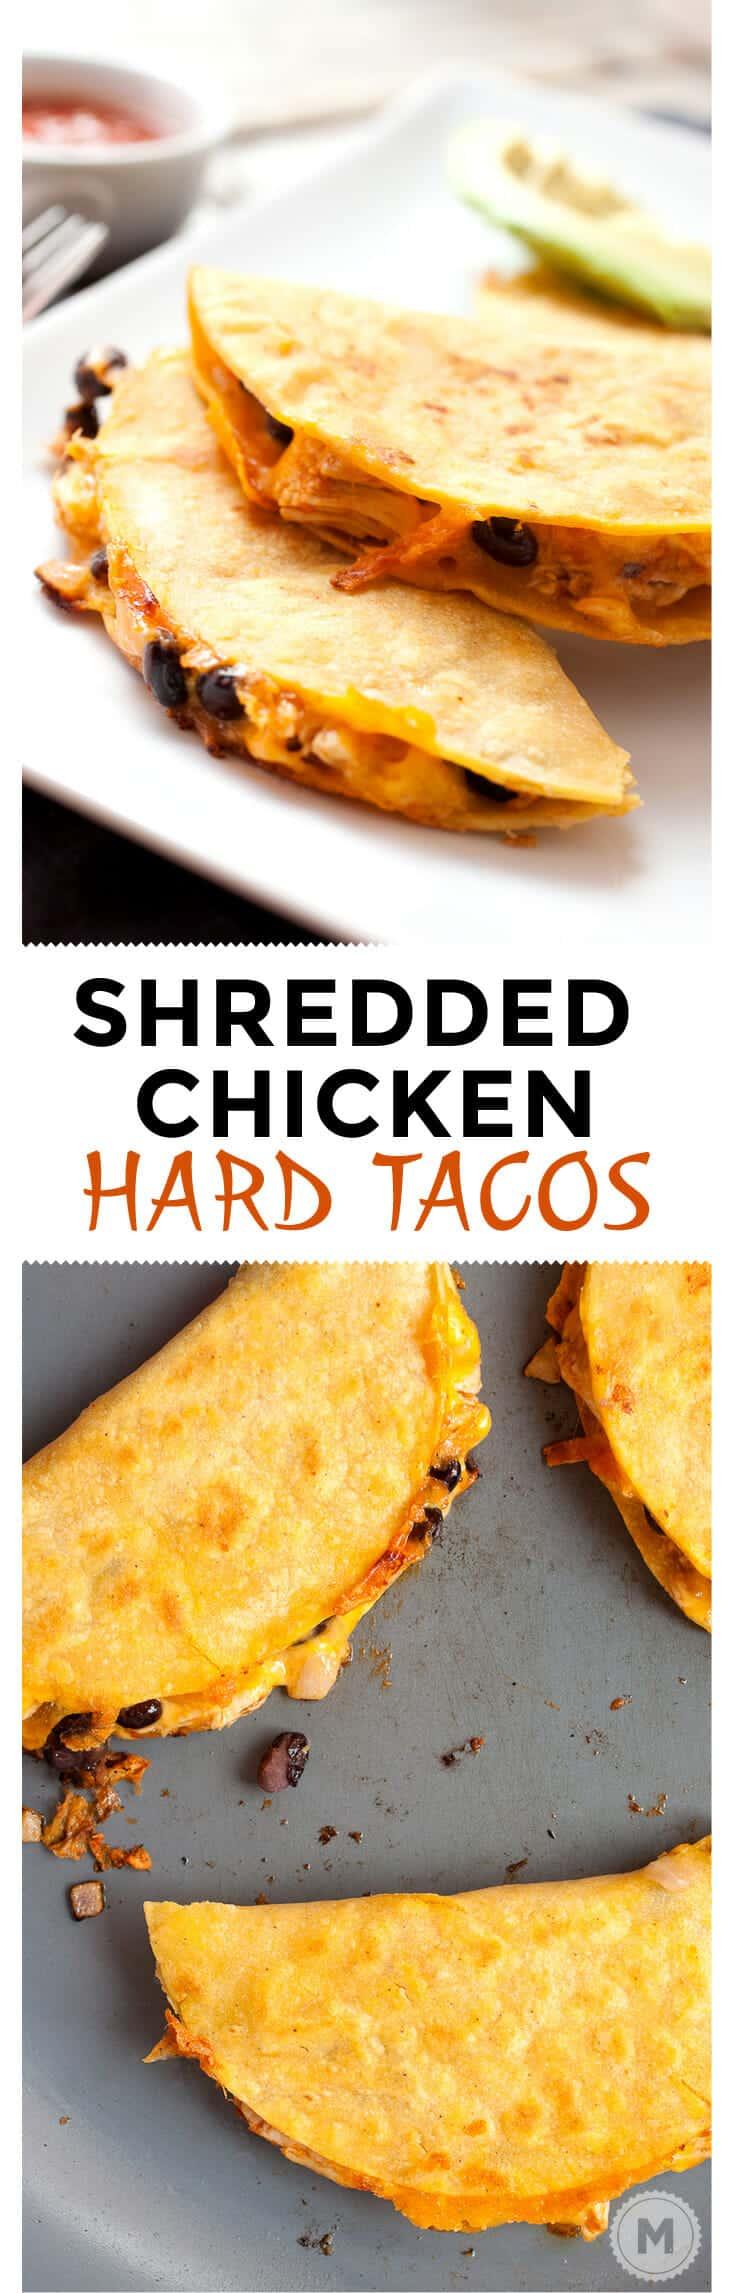 Shredded Chicken Hard Tacos - Easy to Make! ~ Macheesmo